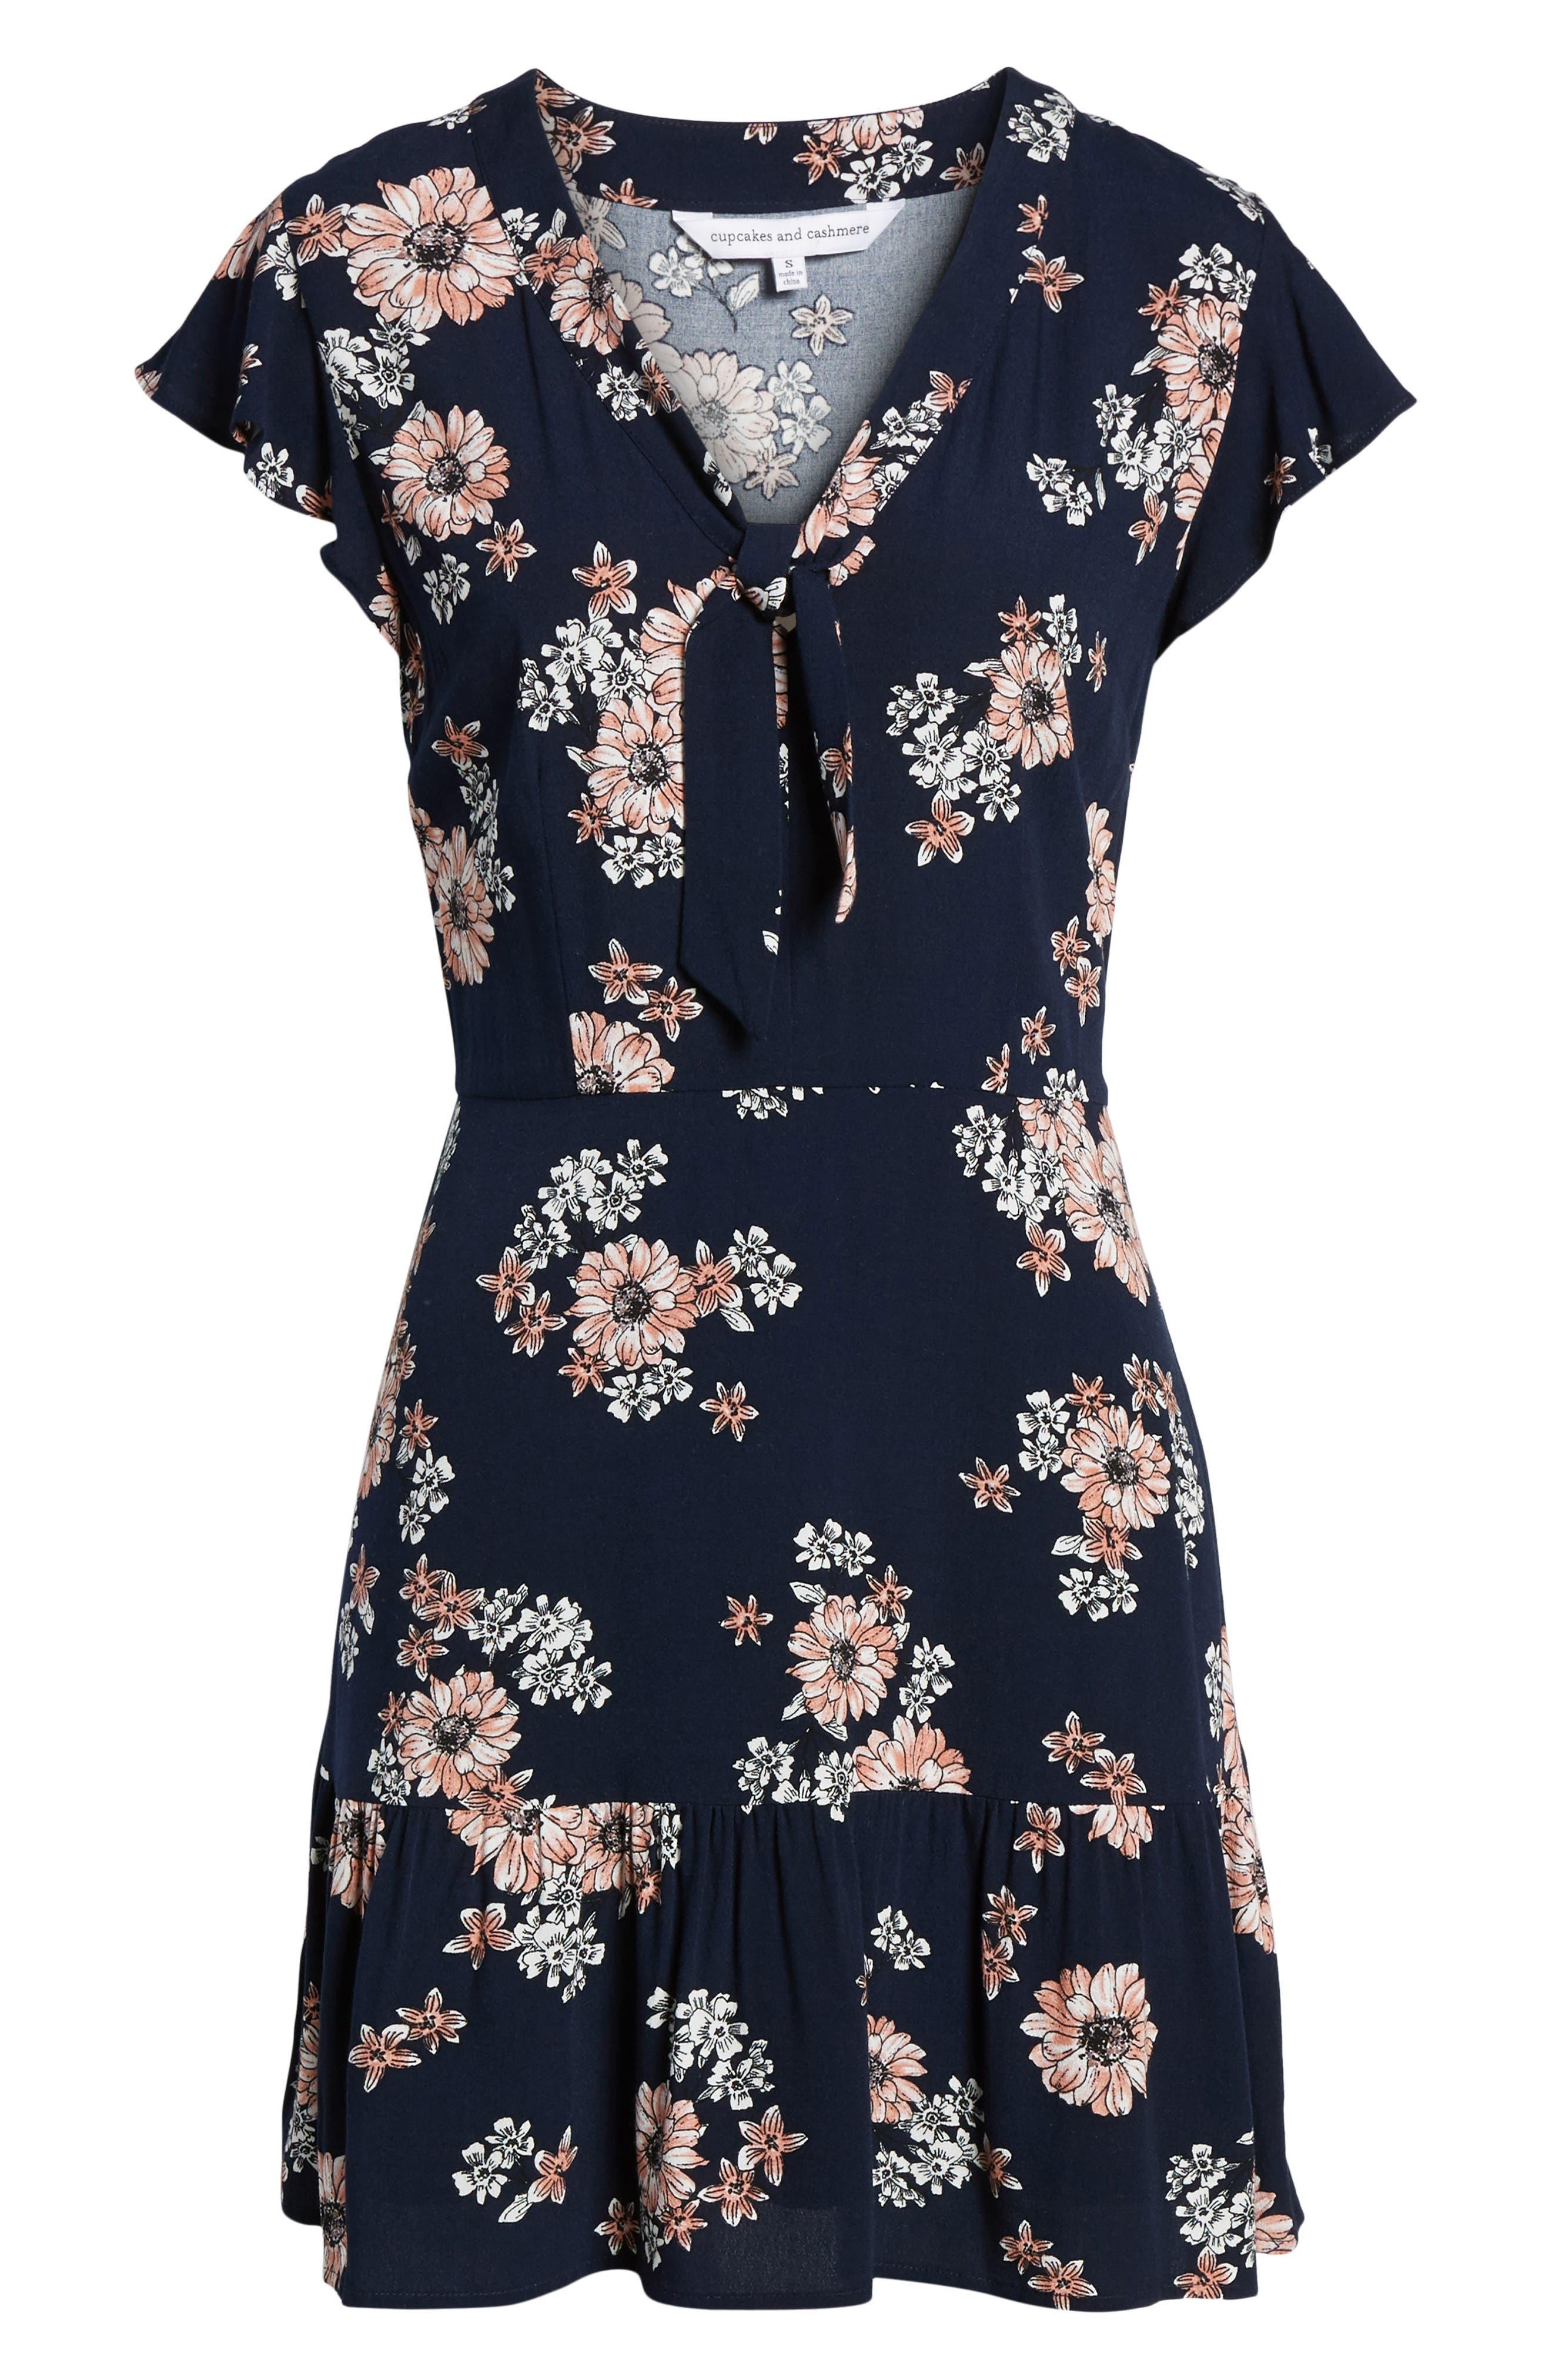 Dalma Floral Print Dress,                             Alternate thumbnail 6, color,